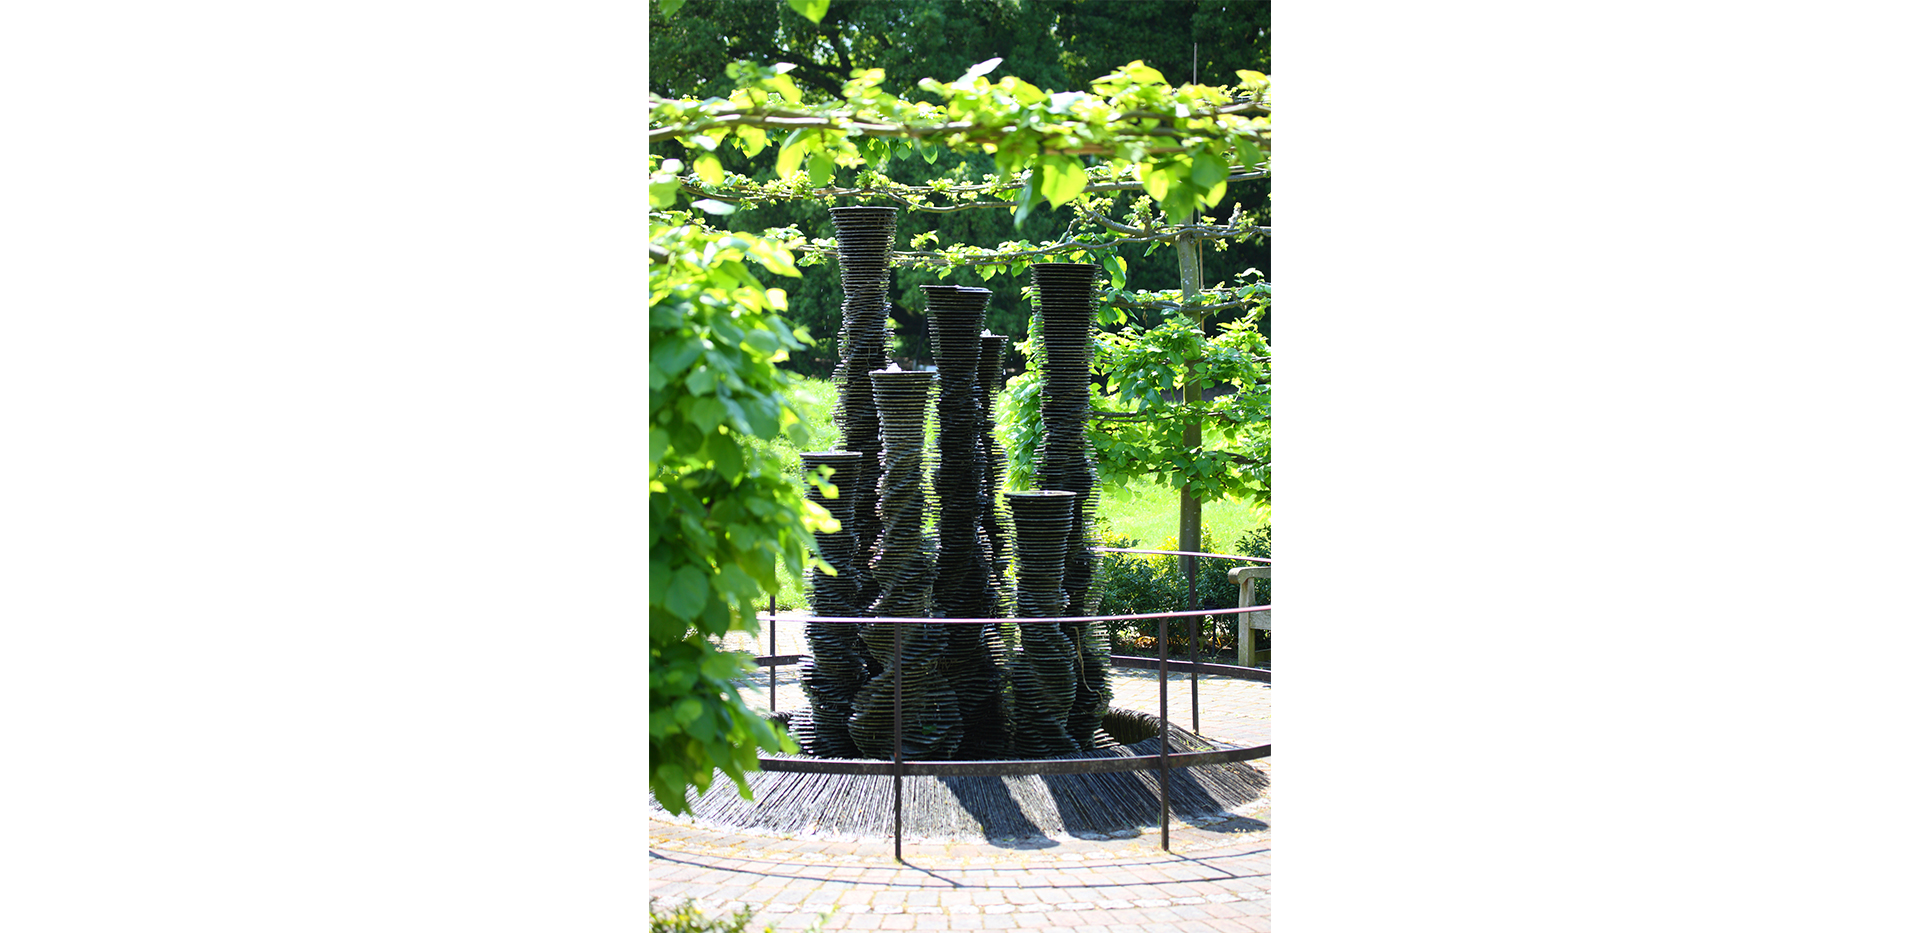 St James, Fitzroy Gate, Kew Gardens